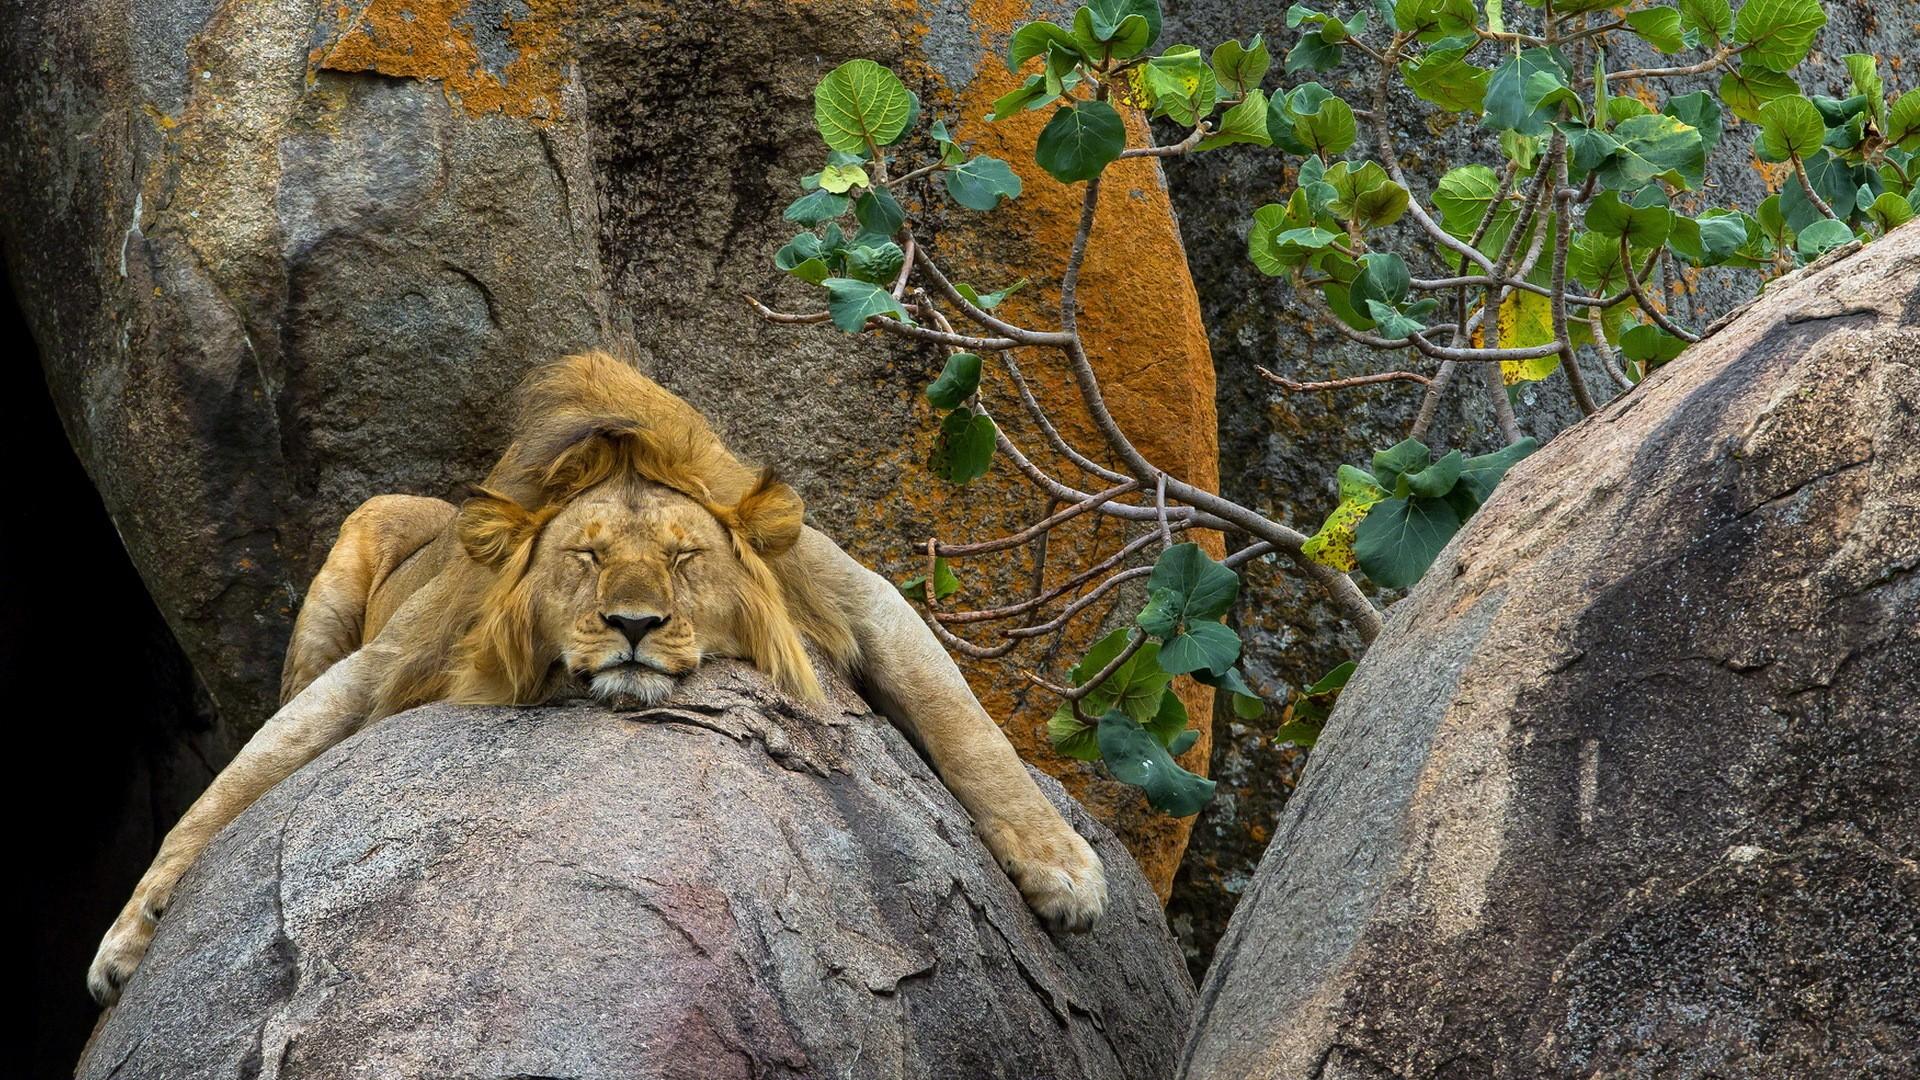 Lion Sleeping Rock Big Cat Predator Animal 1920x1080